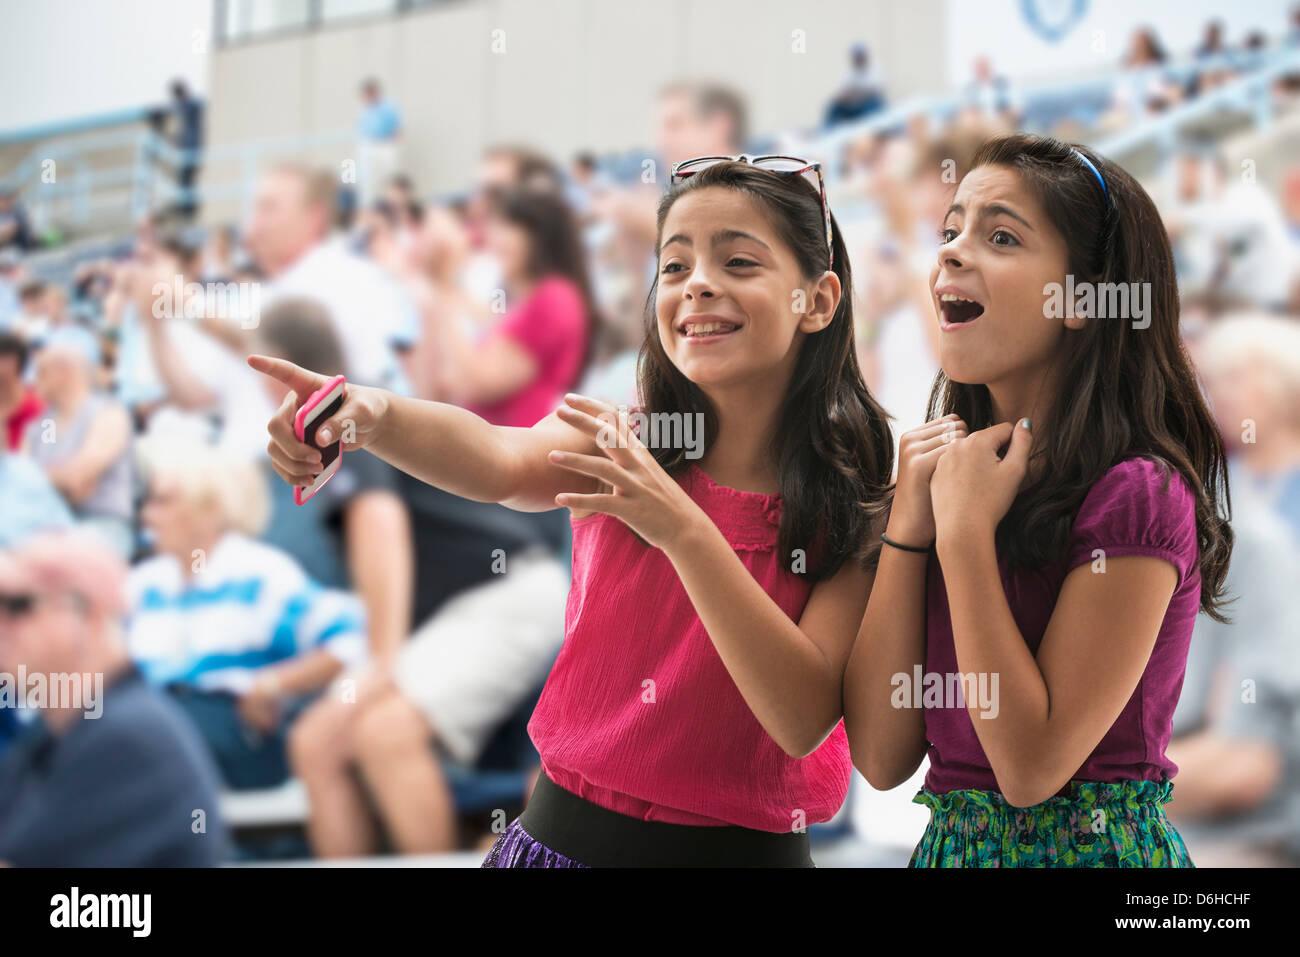 Adoring girls at pop concert - Stock Image